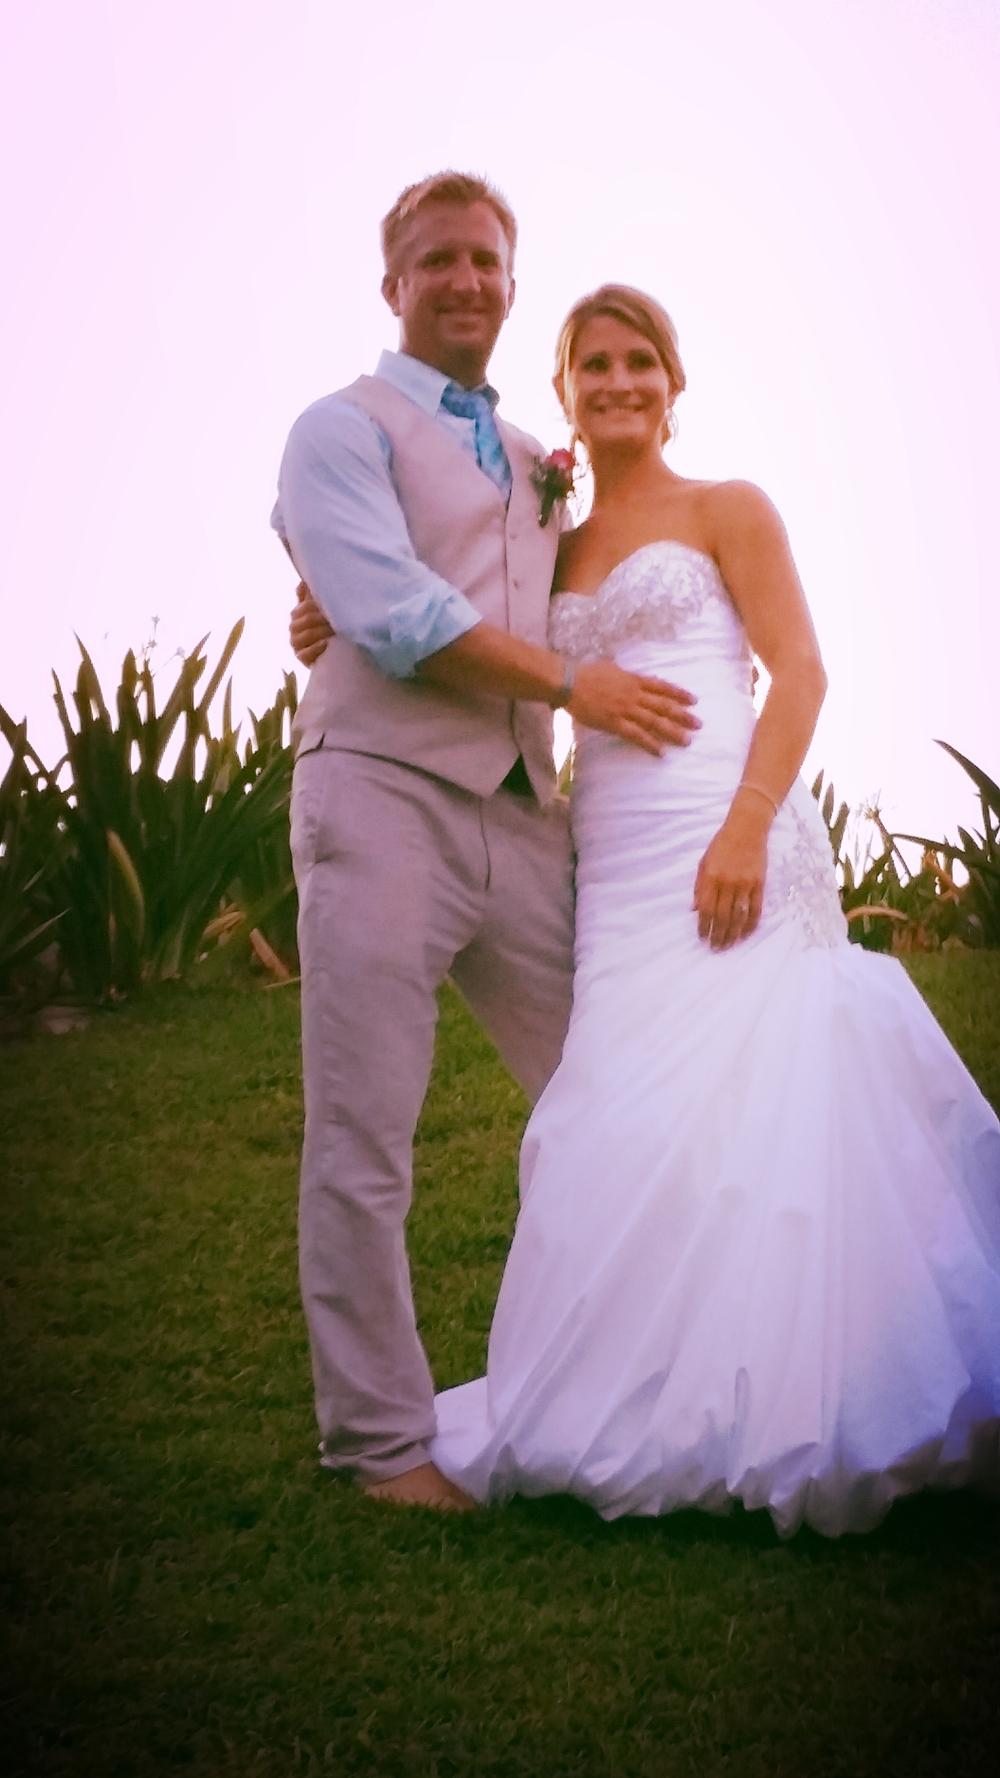 Dan & Mandy // Cancun, Mexico